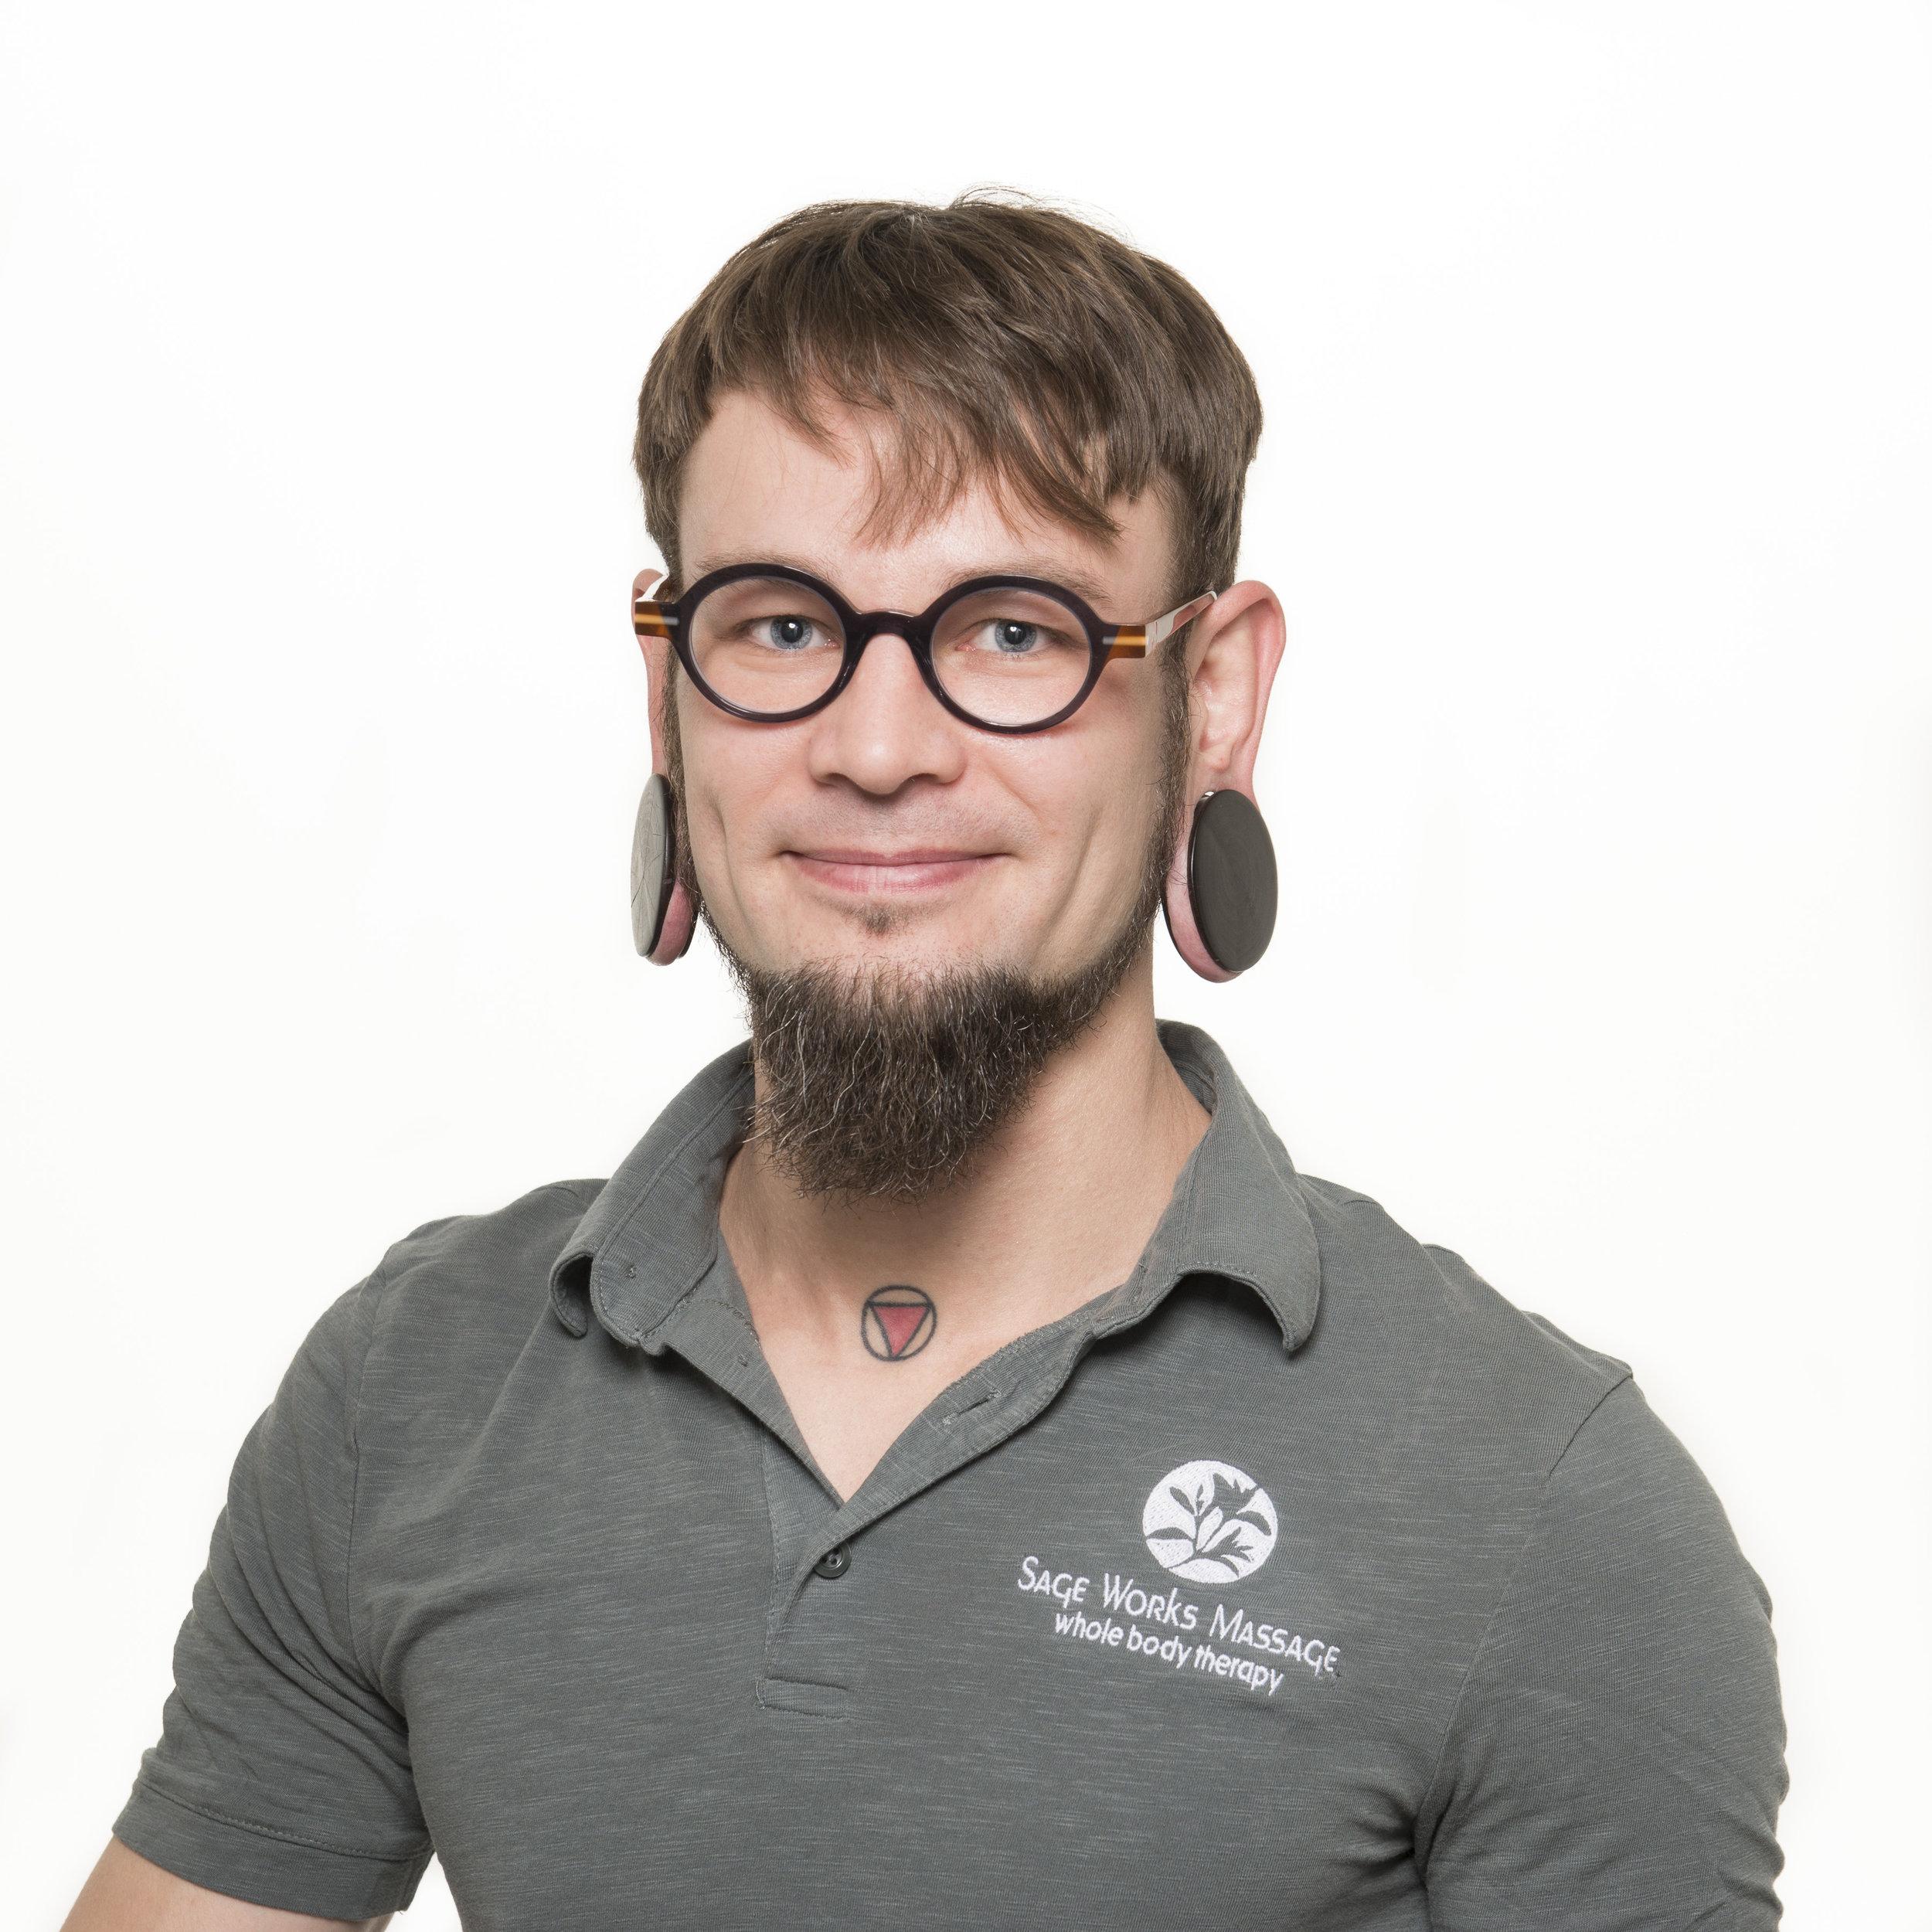 Jared Geurts - Owner and Practitioner at Sage Works Massage